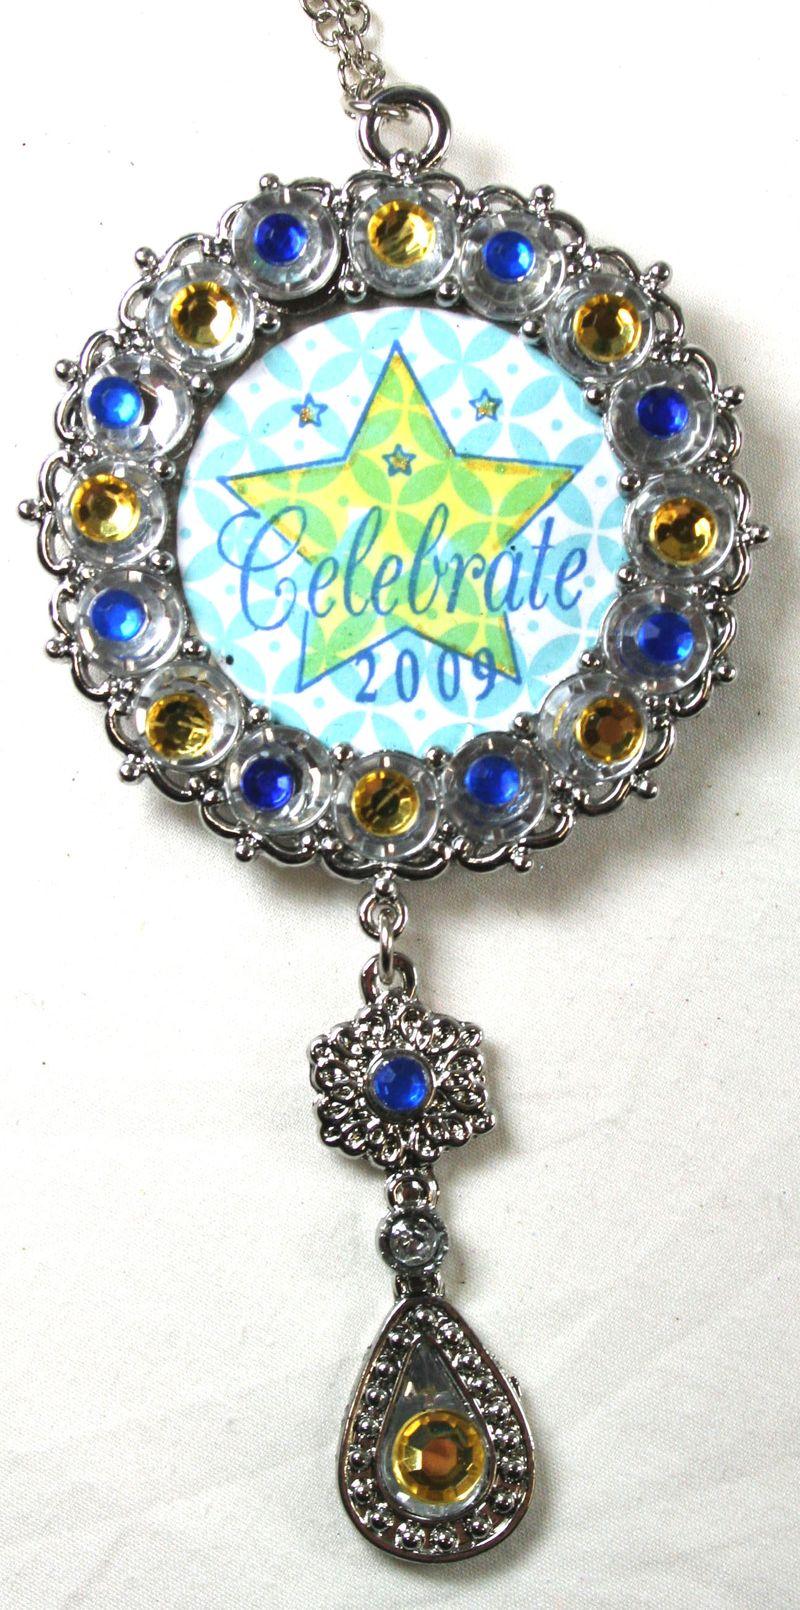 Celebrate 2009